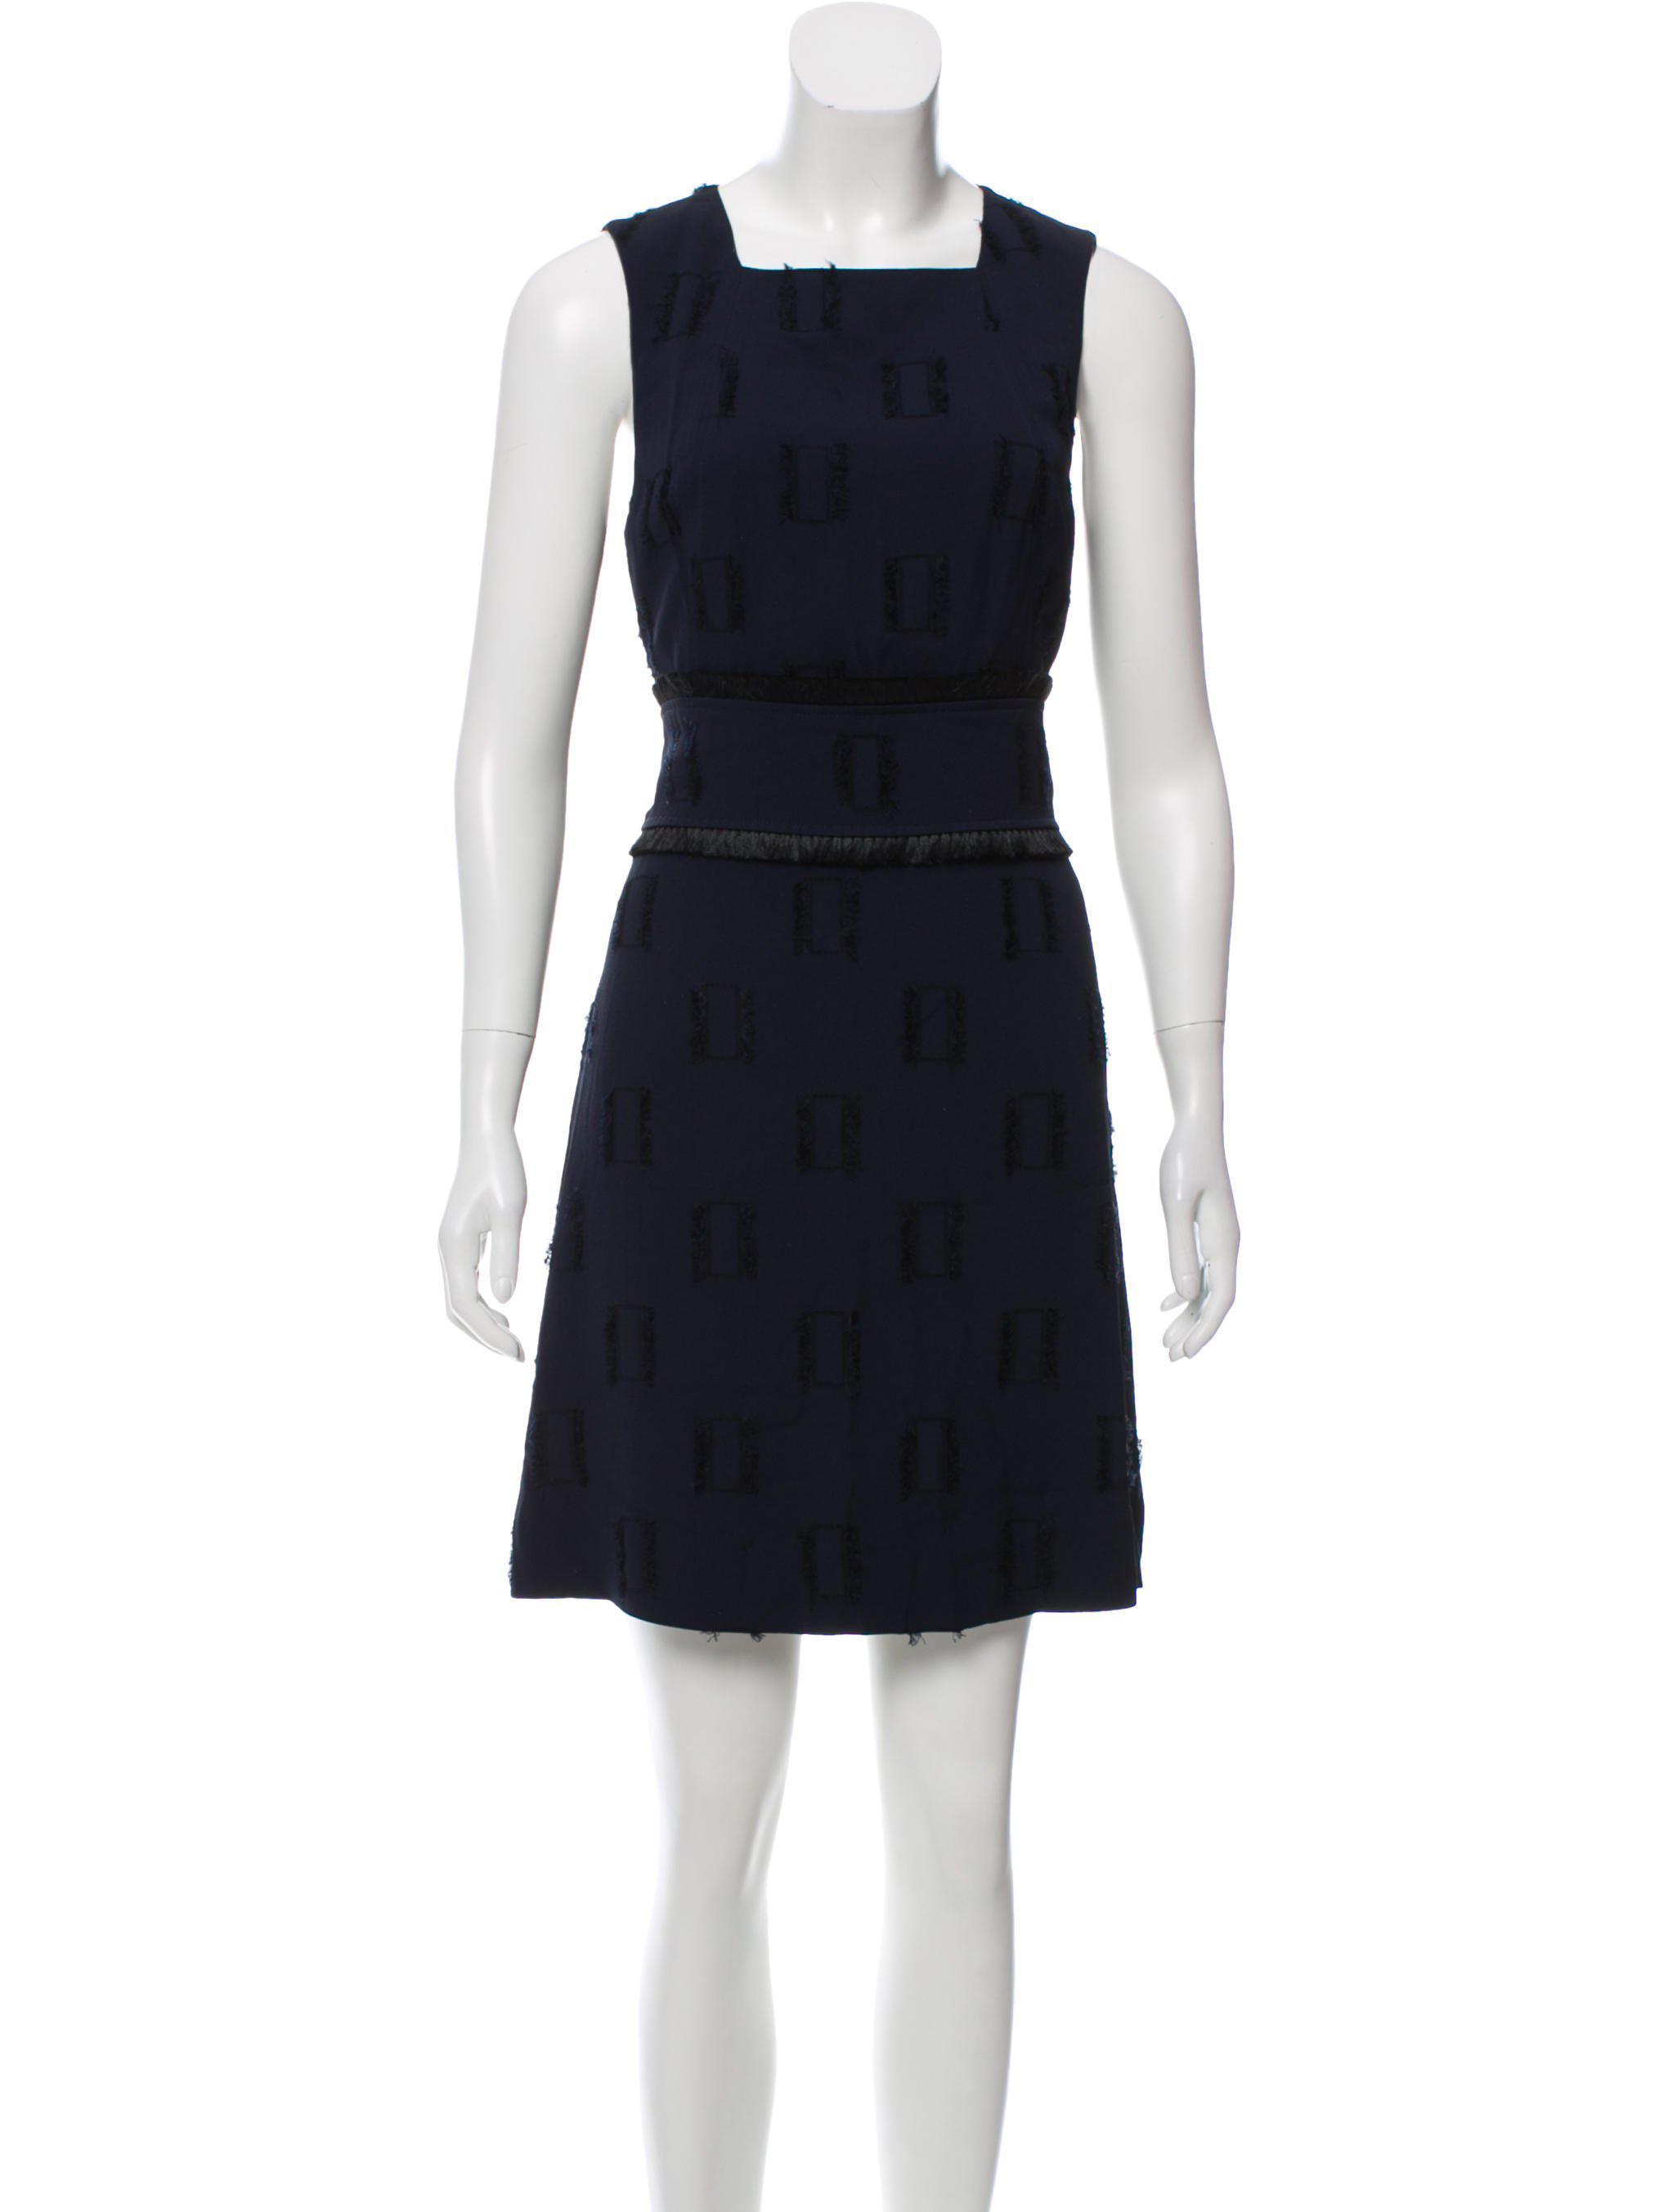 1ac9a7e2a Lyst - 10 Crosby Derek Lam Fringe-accented Shift Dress in Blue